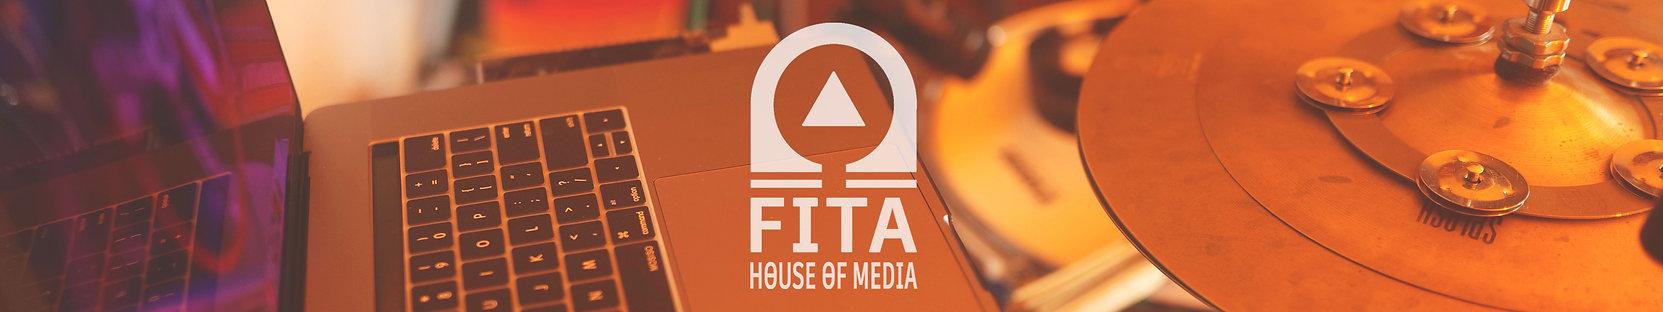 FITA_WEBSITE_DESIGN_BANNER.jpg